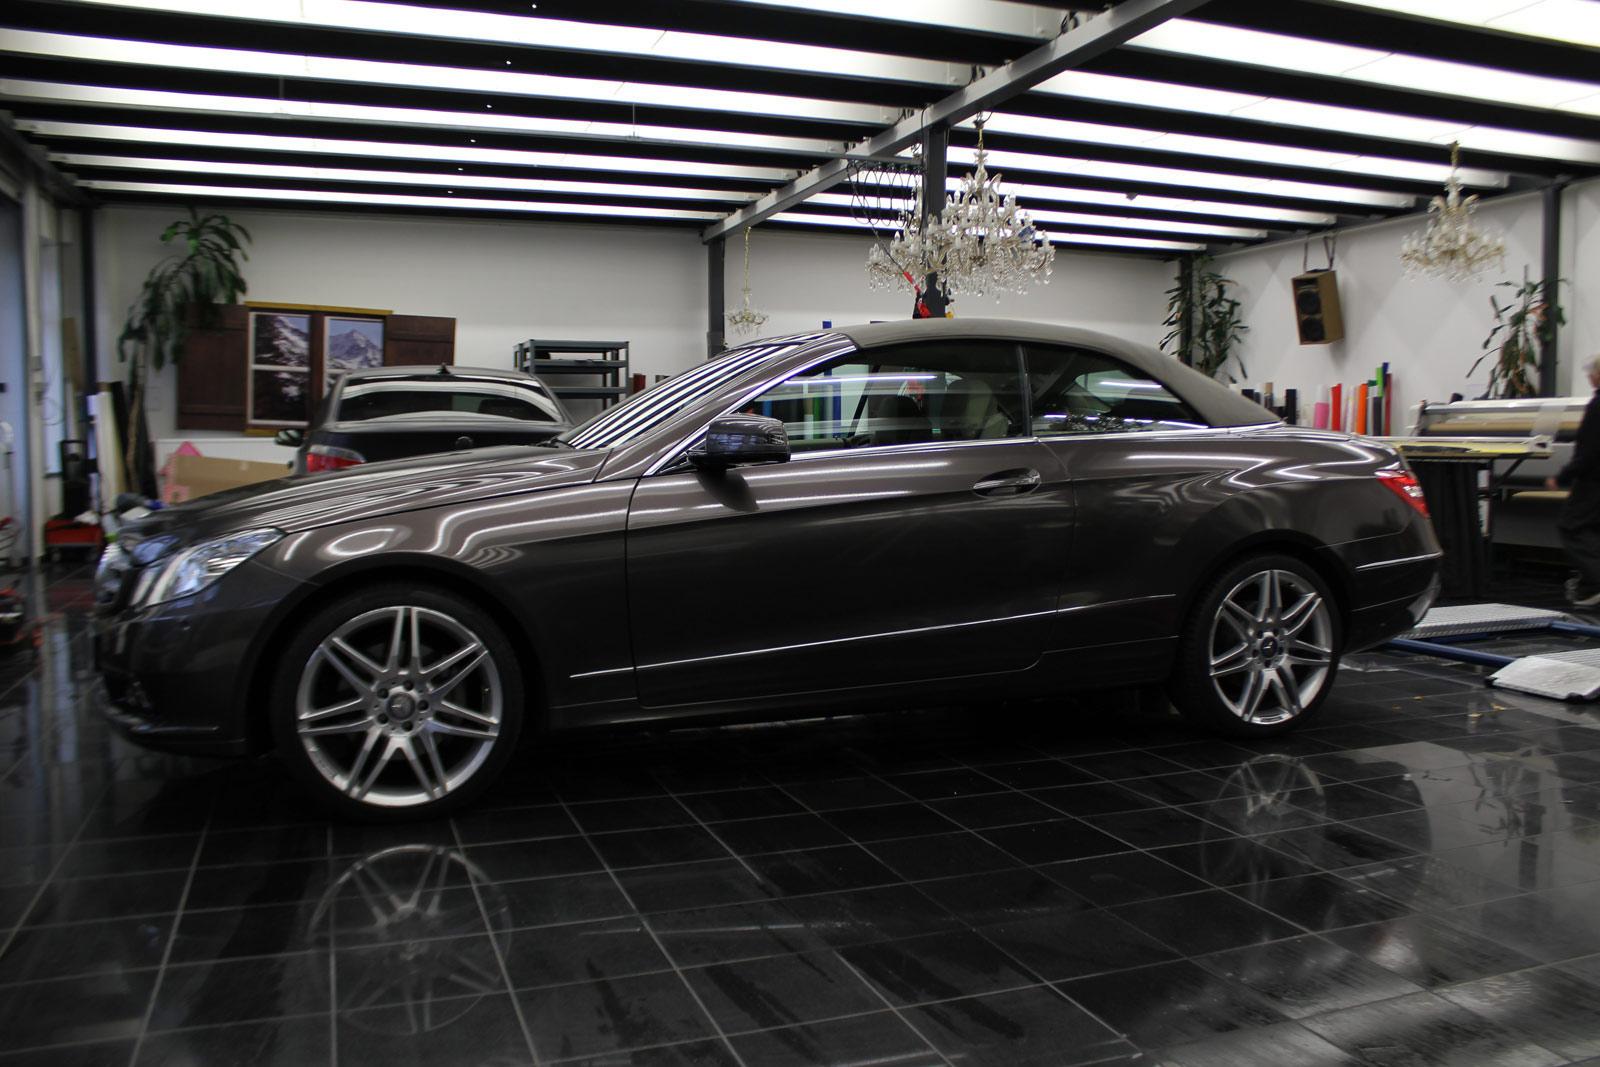 Mercedes_E-Klasse_Cabrio_Folierung_Stannitgrau_Metallic_Glanz_30